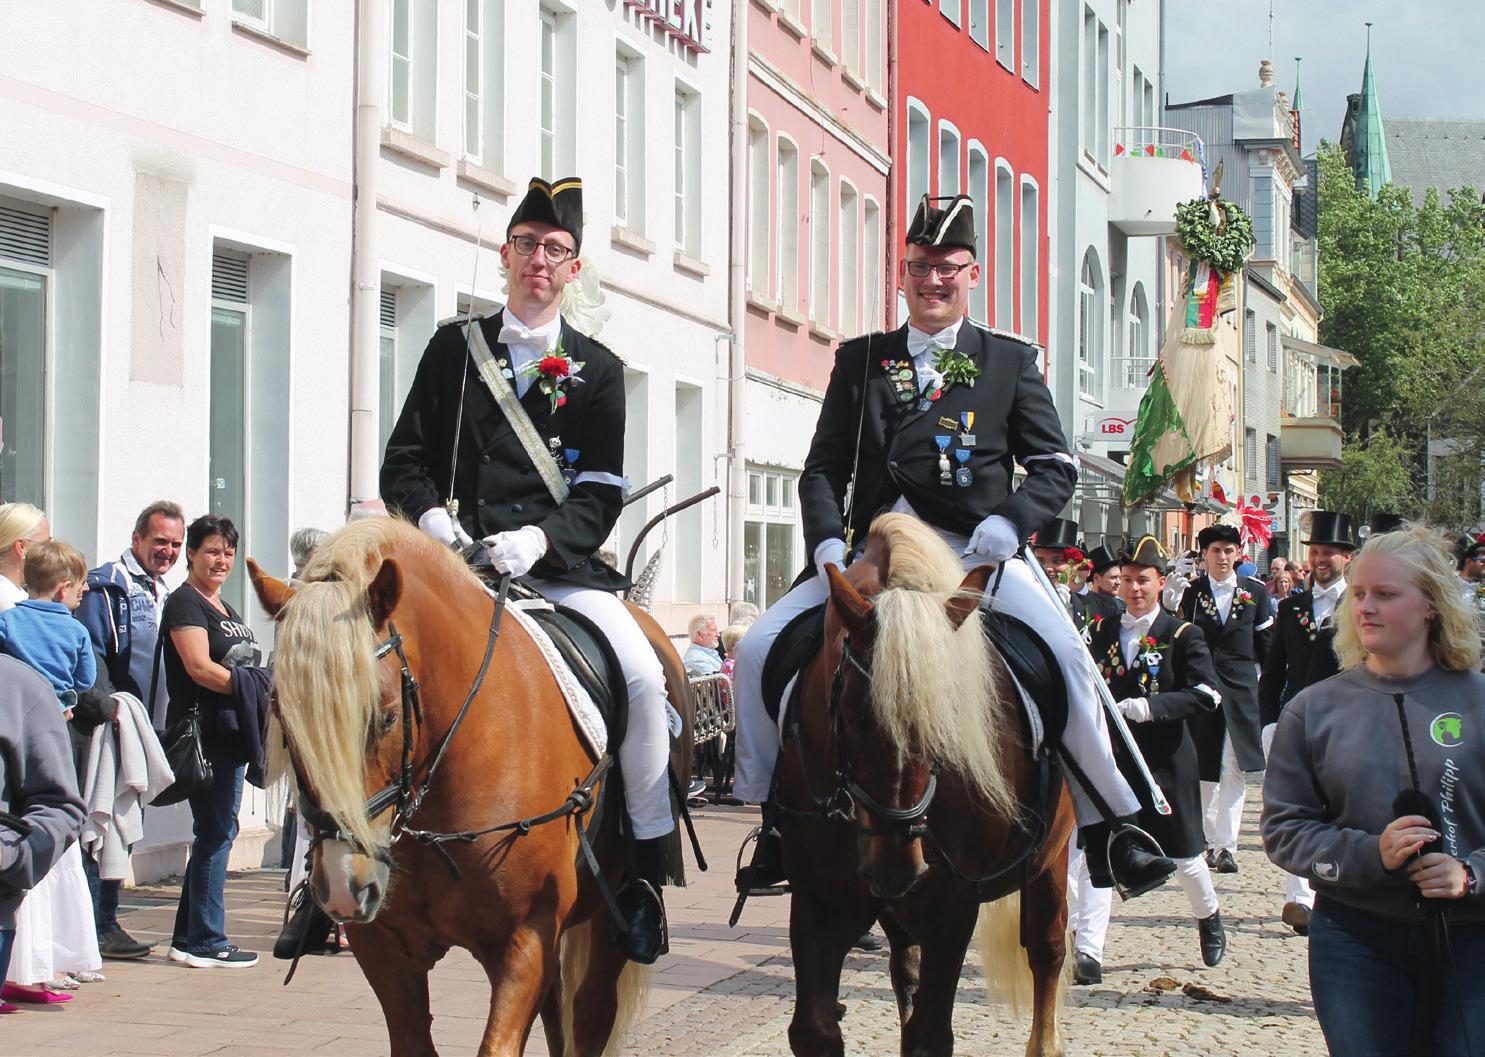 Freischiessen Fotoheft - Juli 2019 - I. Image 3